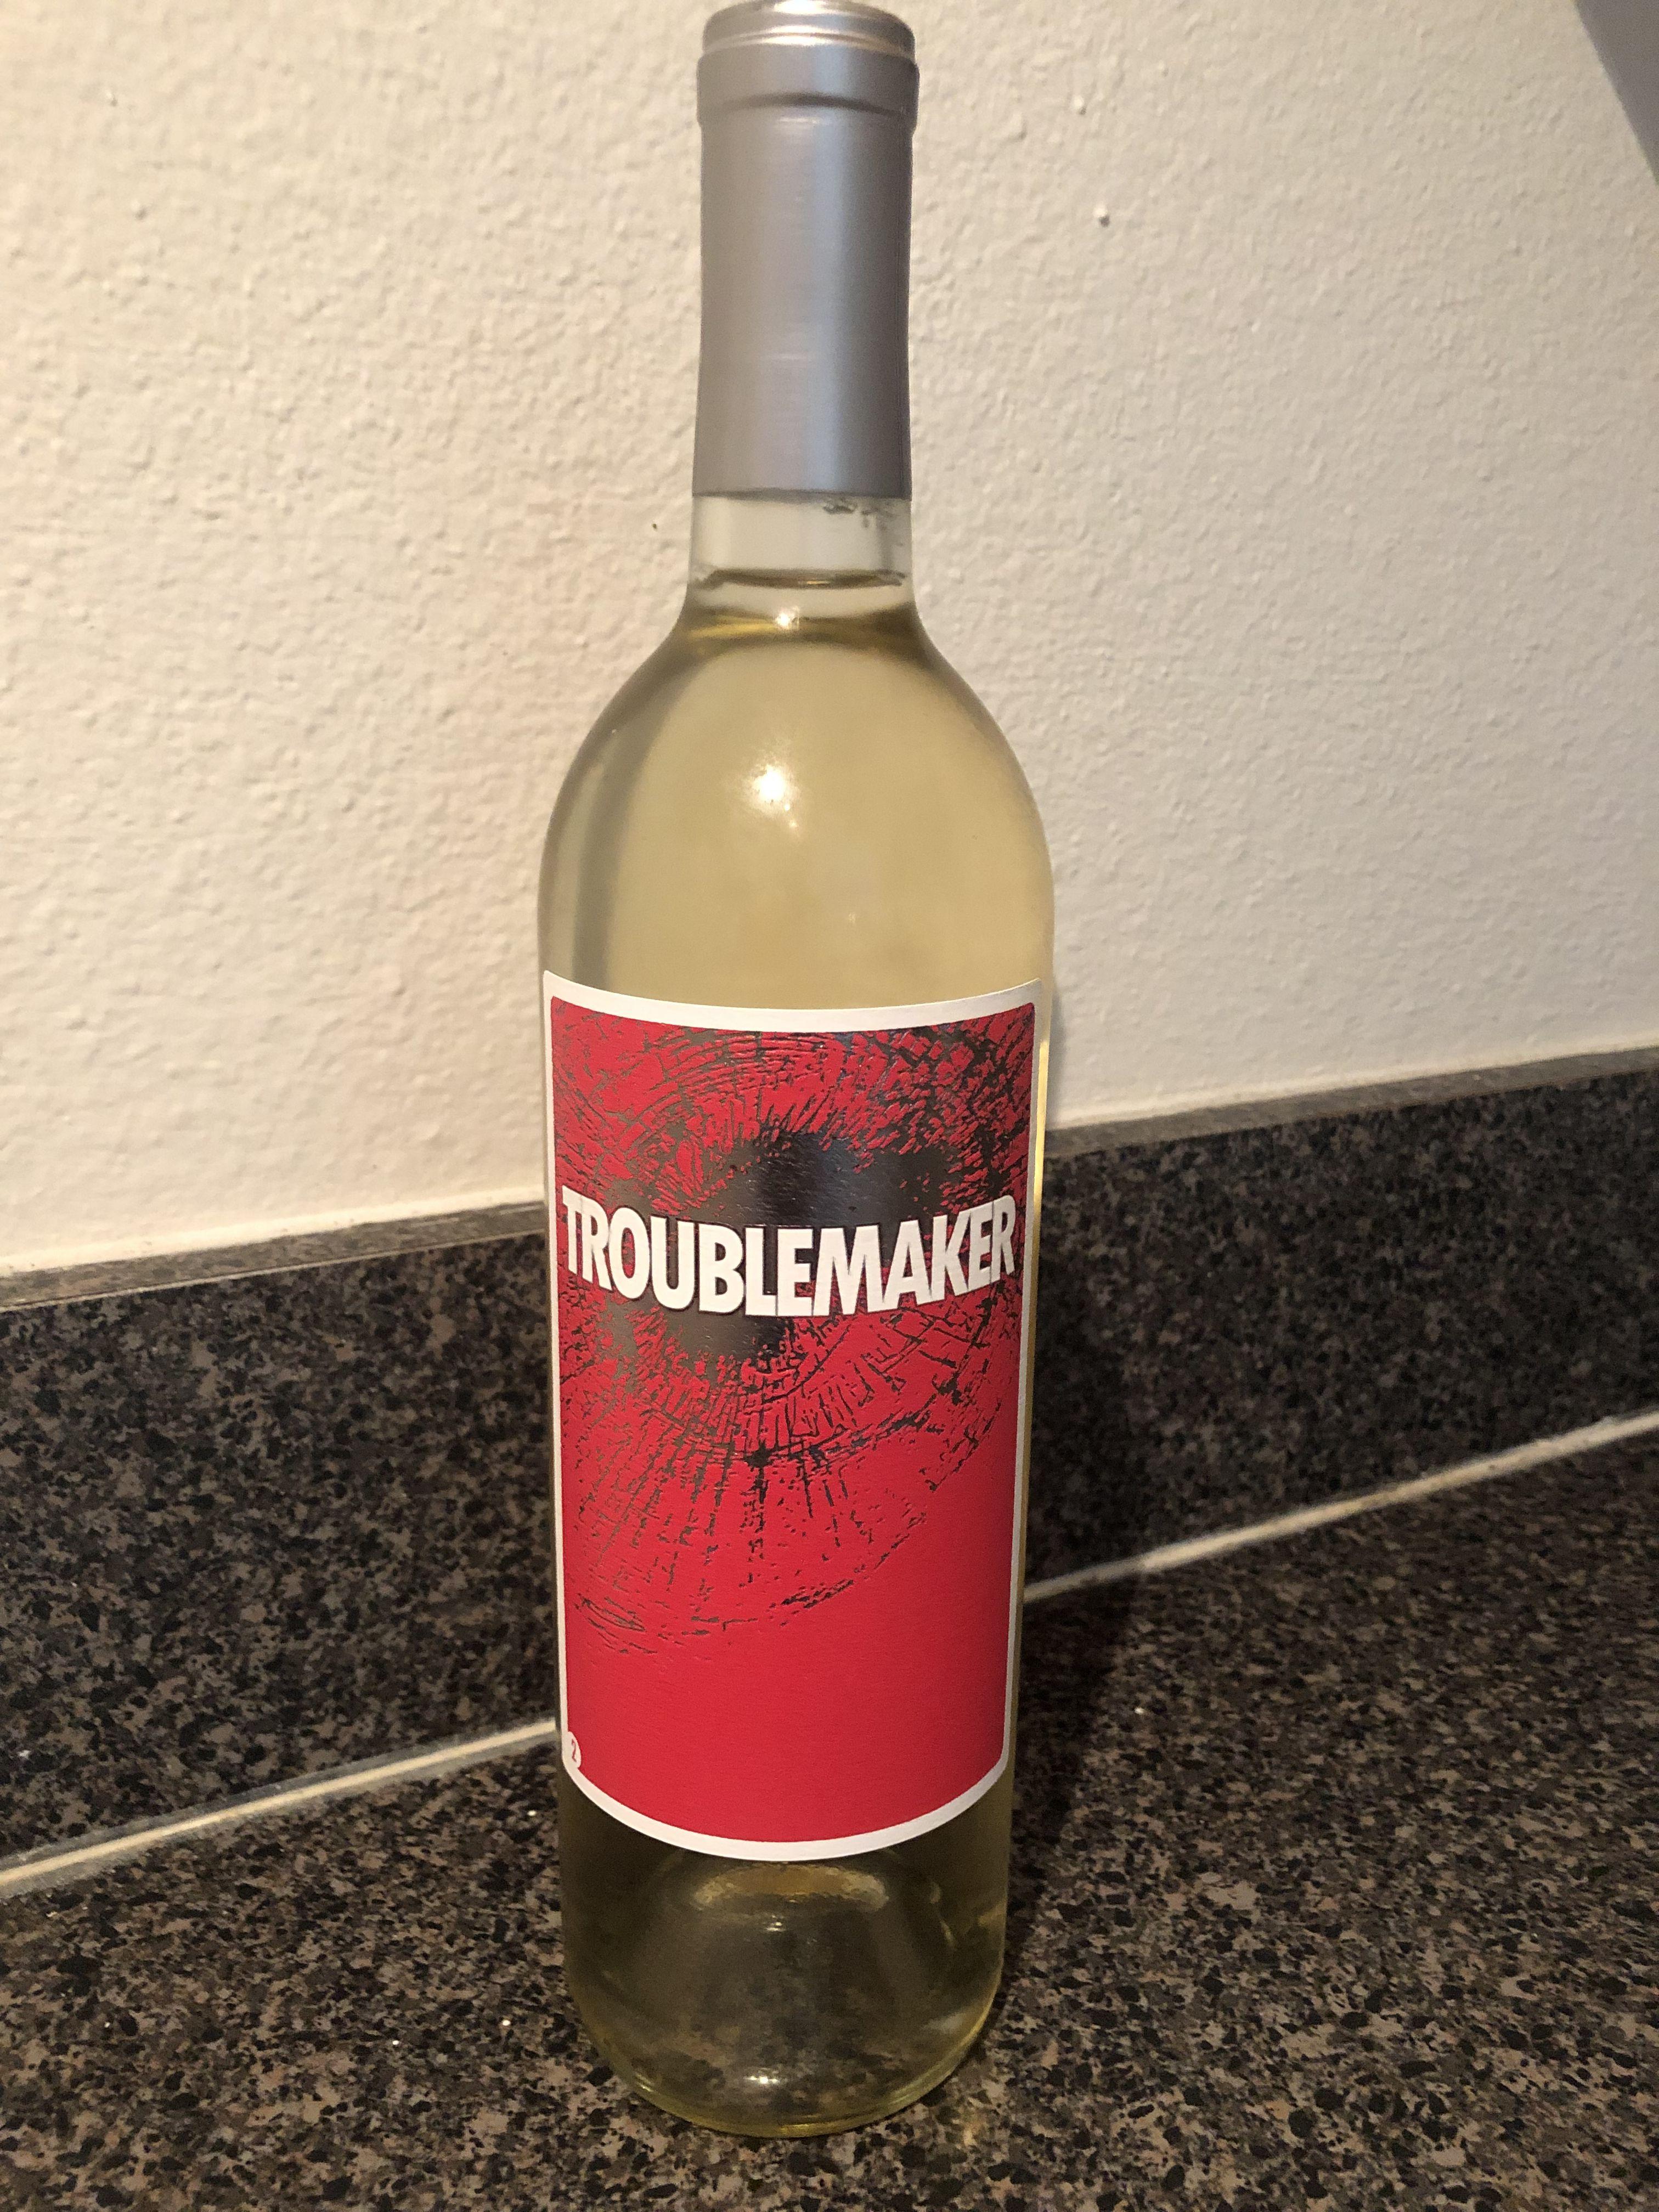 Da Serie Criadora De Problemas Sou Tao Fa Do Trader Joe S E Faco Tanta Propaganda Gratuita Deles Que Acho Que Eles La Wine Bottle Drinks